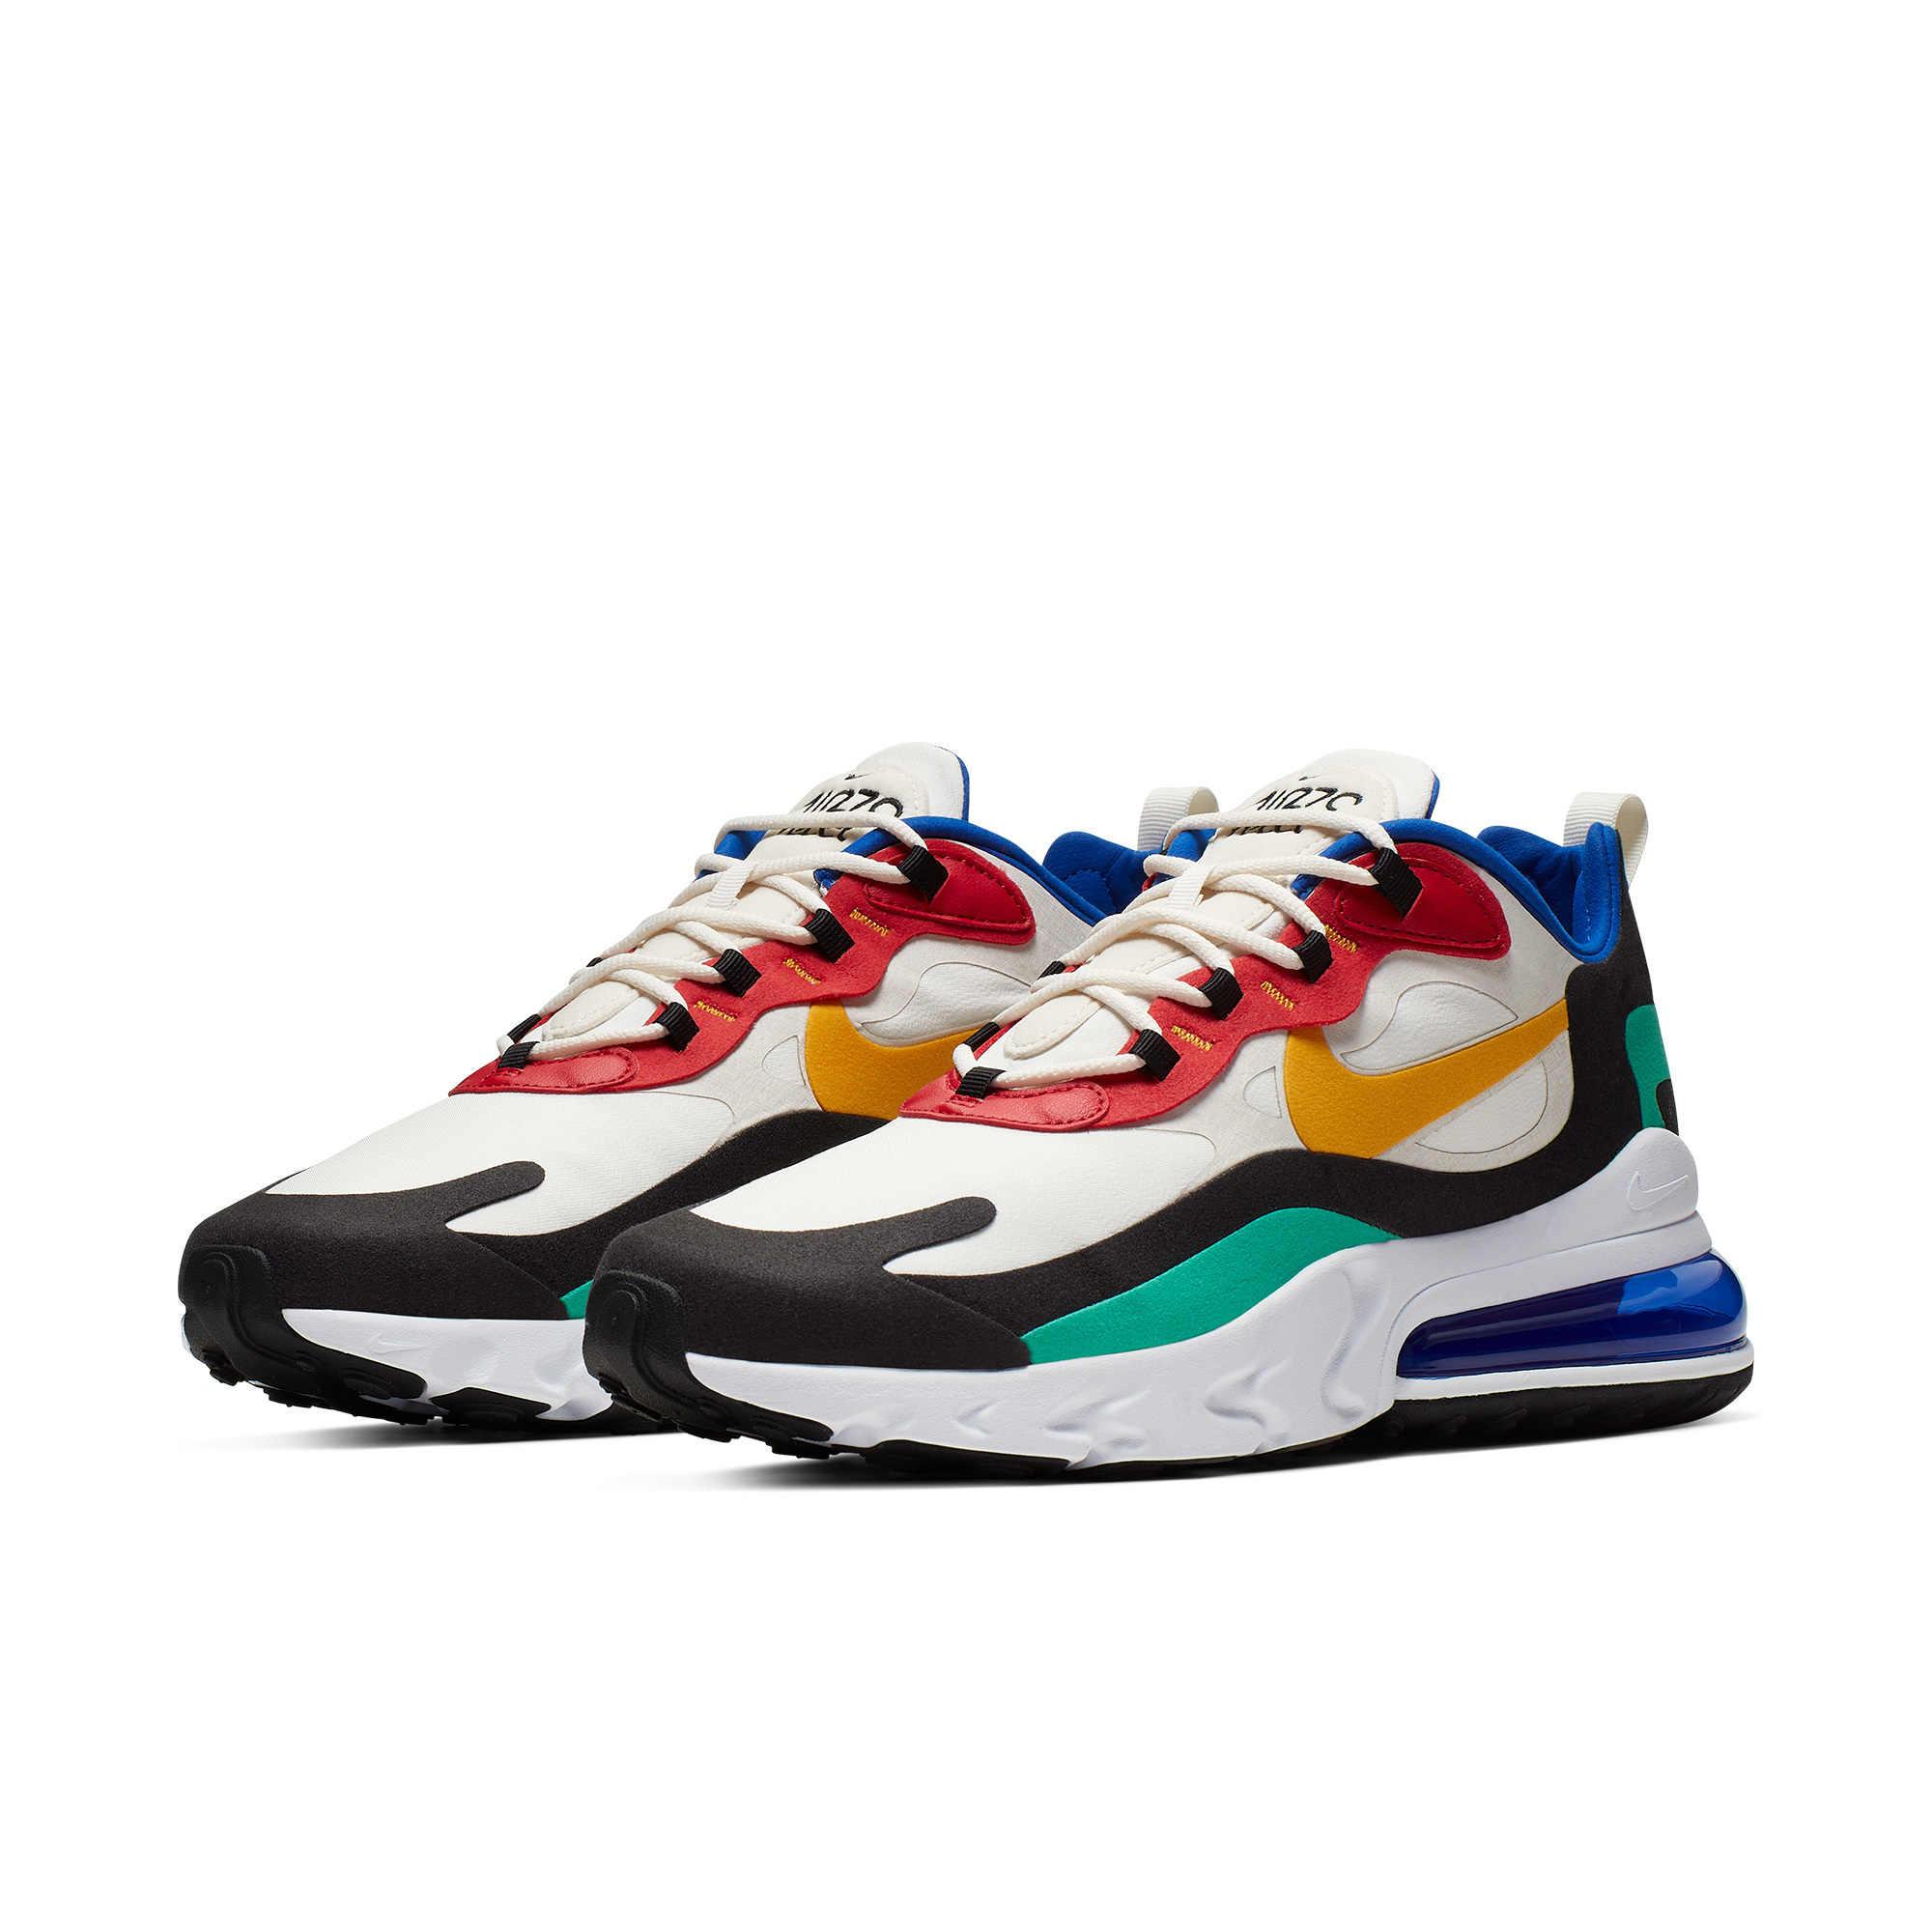 Nike Air Max 270 React Running Shoes